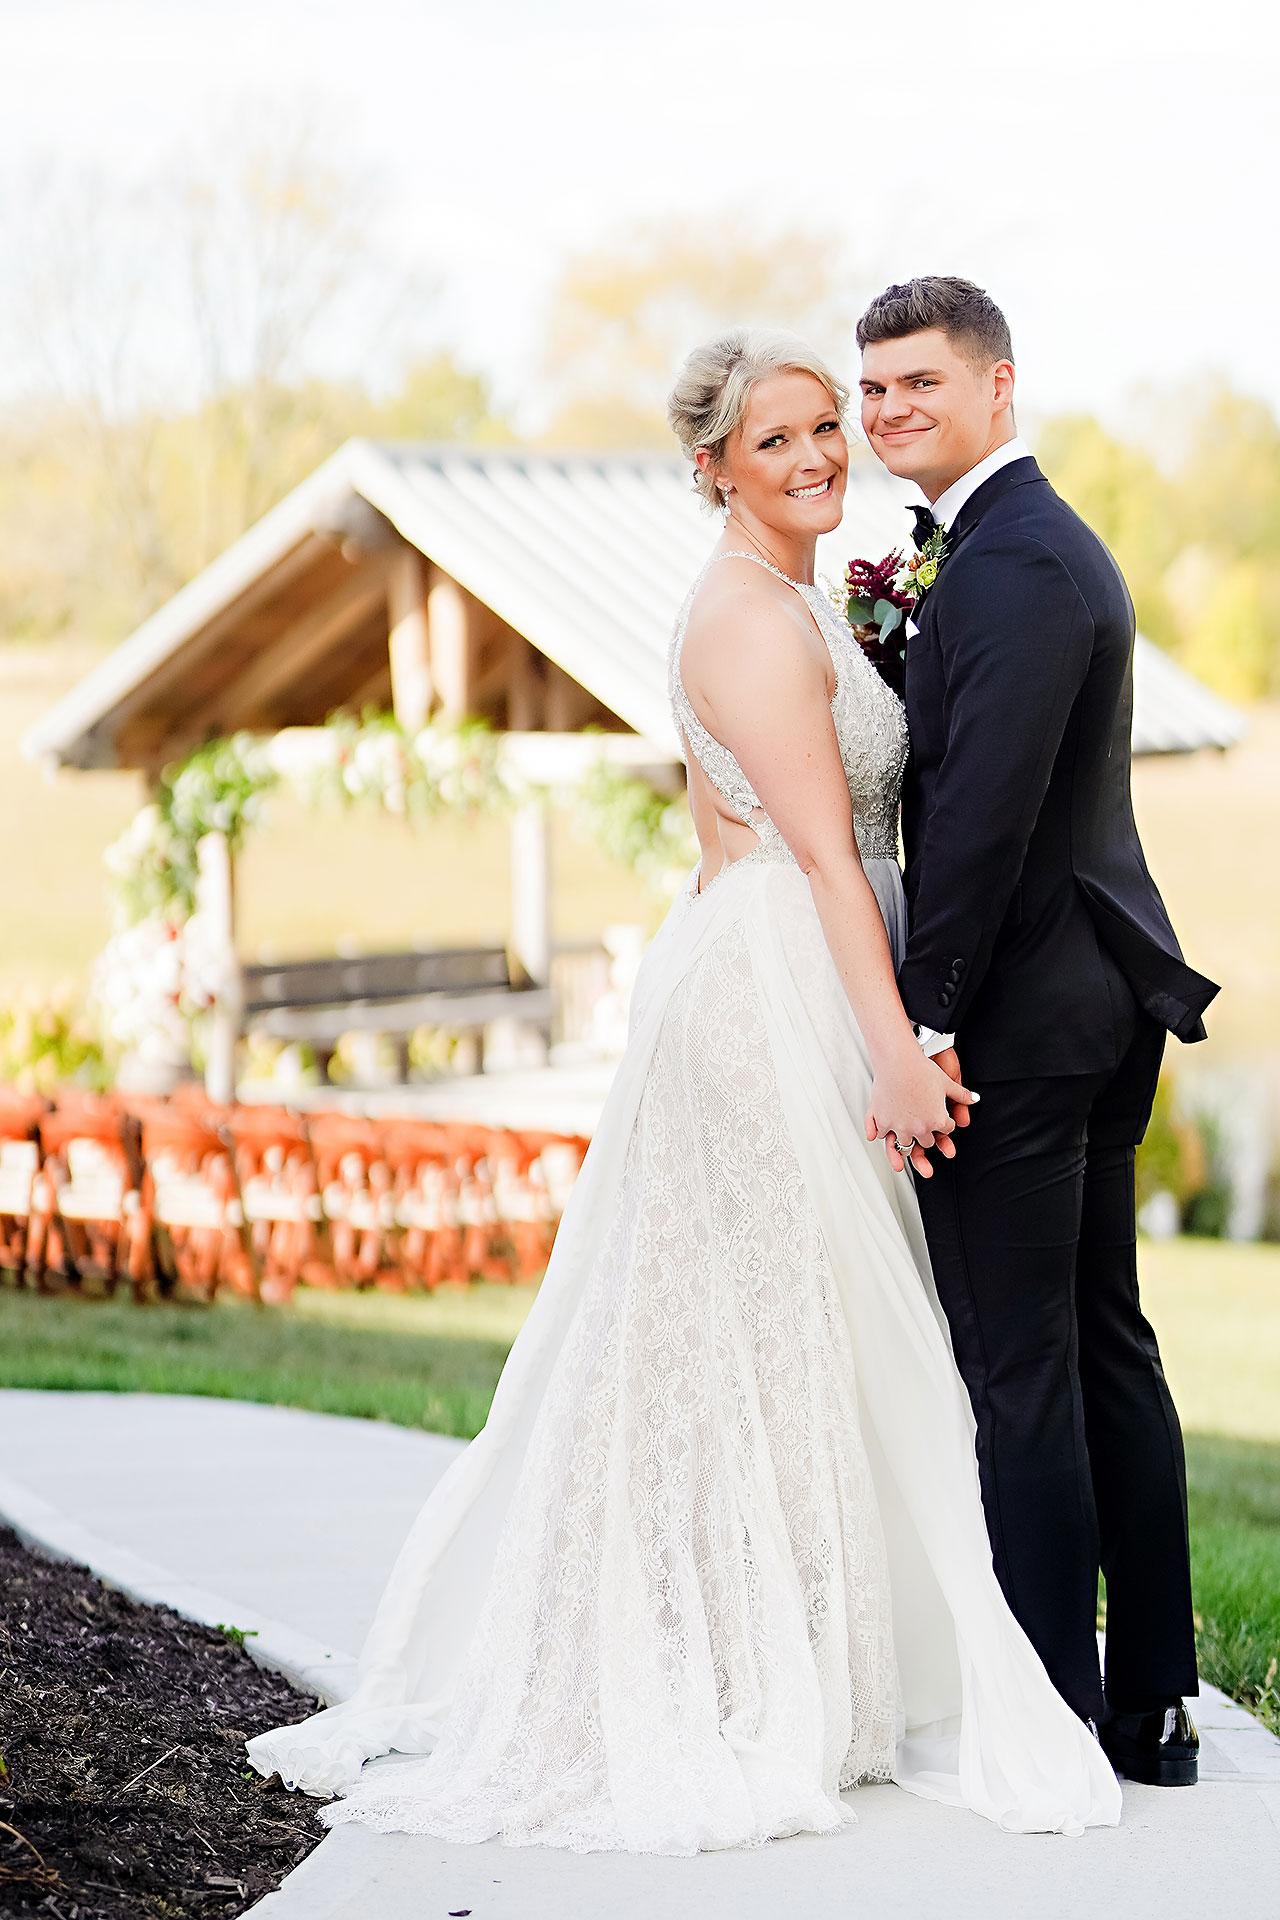 Samantha Grant Lindley Farmstead at Chatham Hills Wedding 082